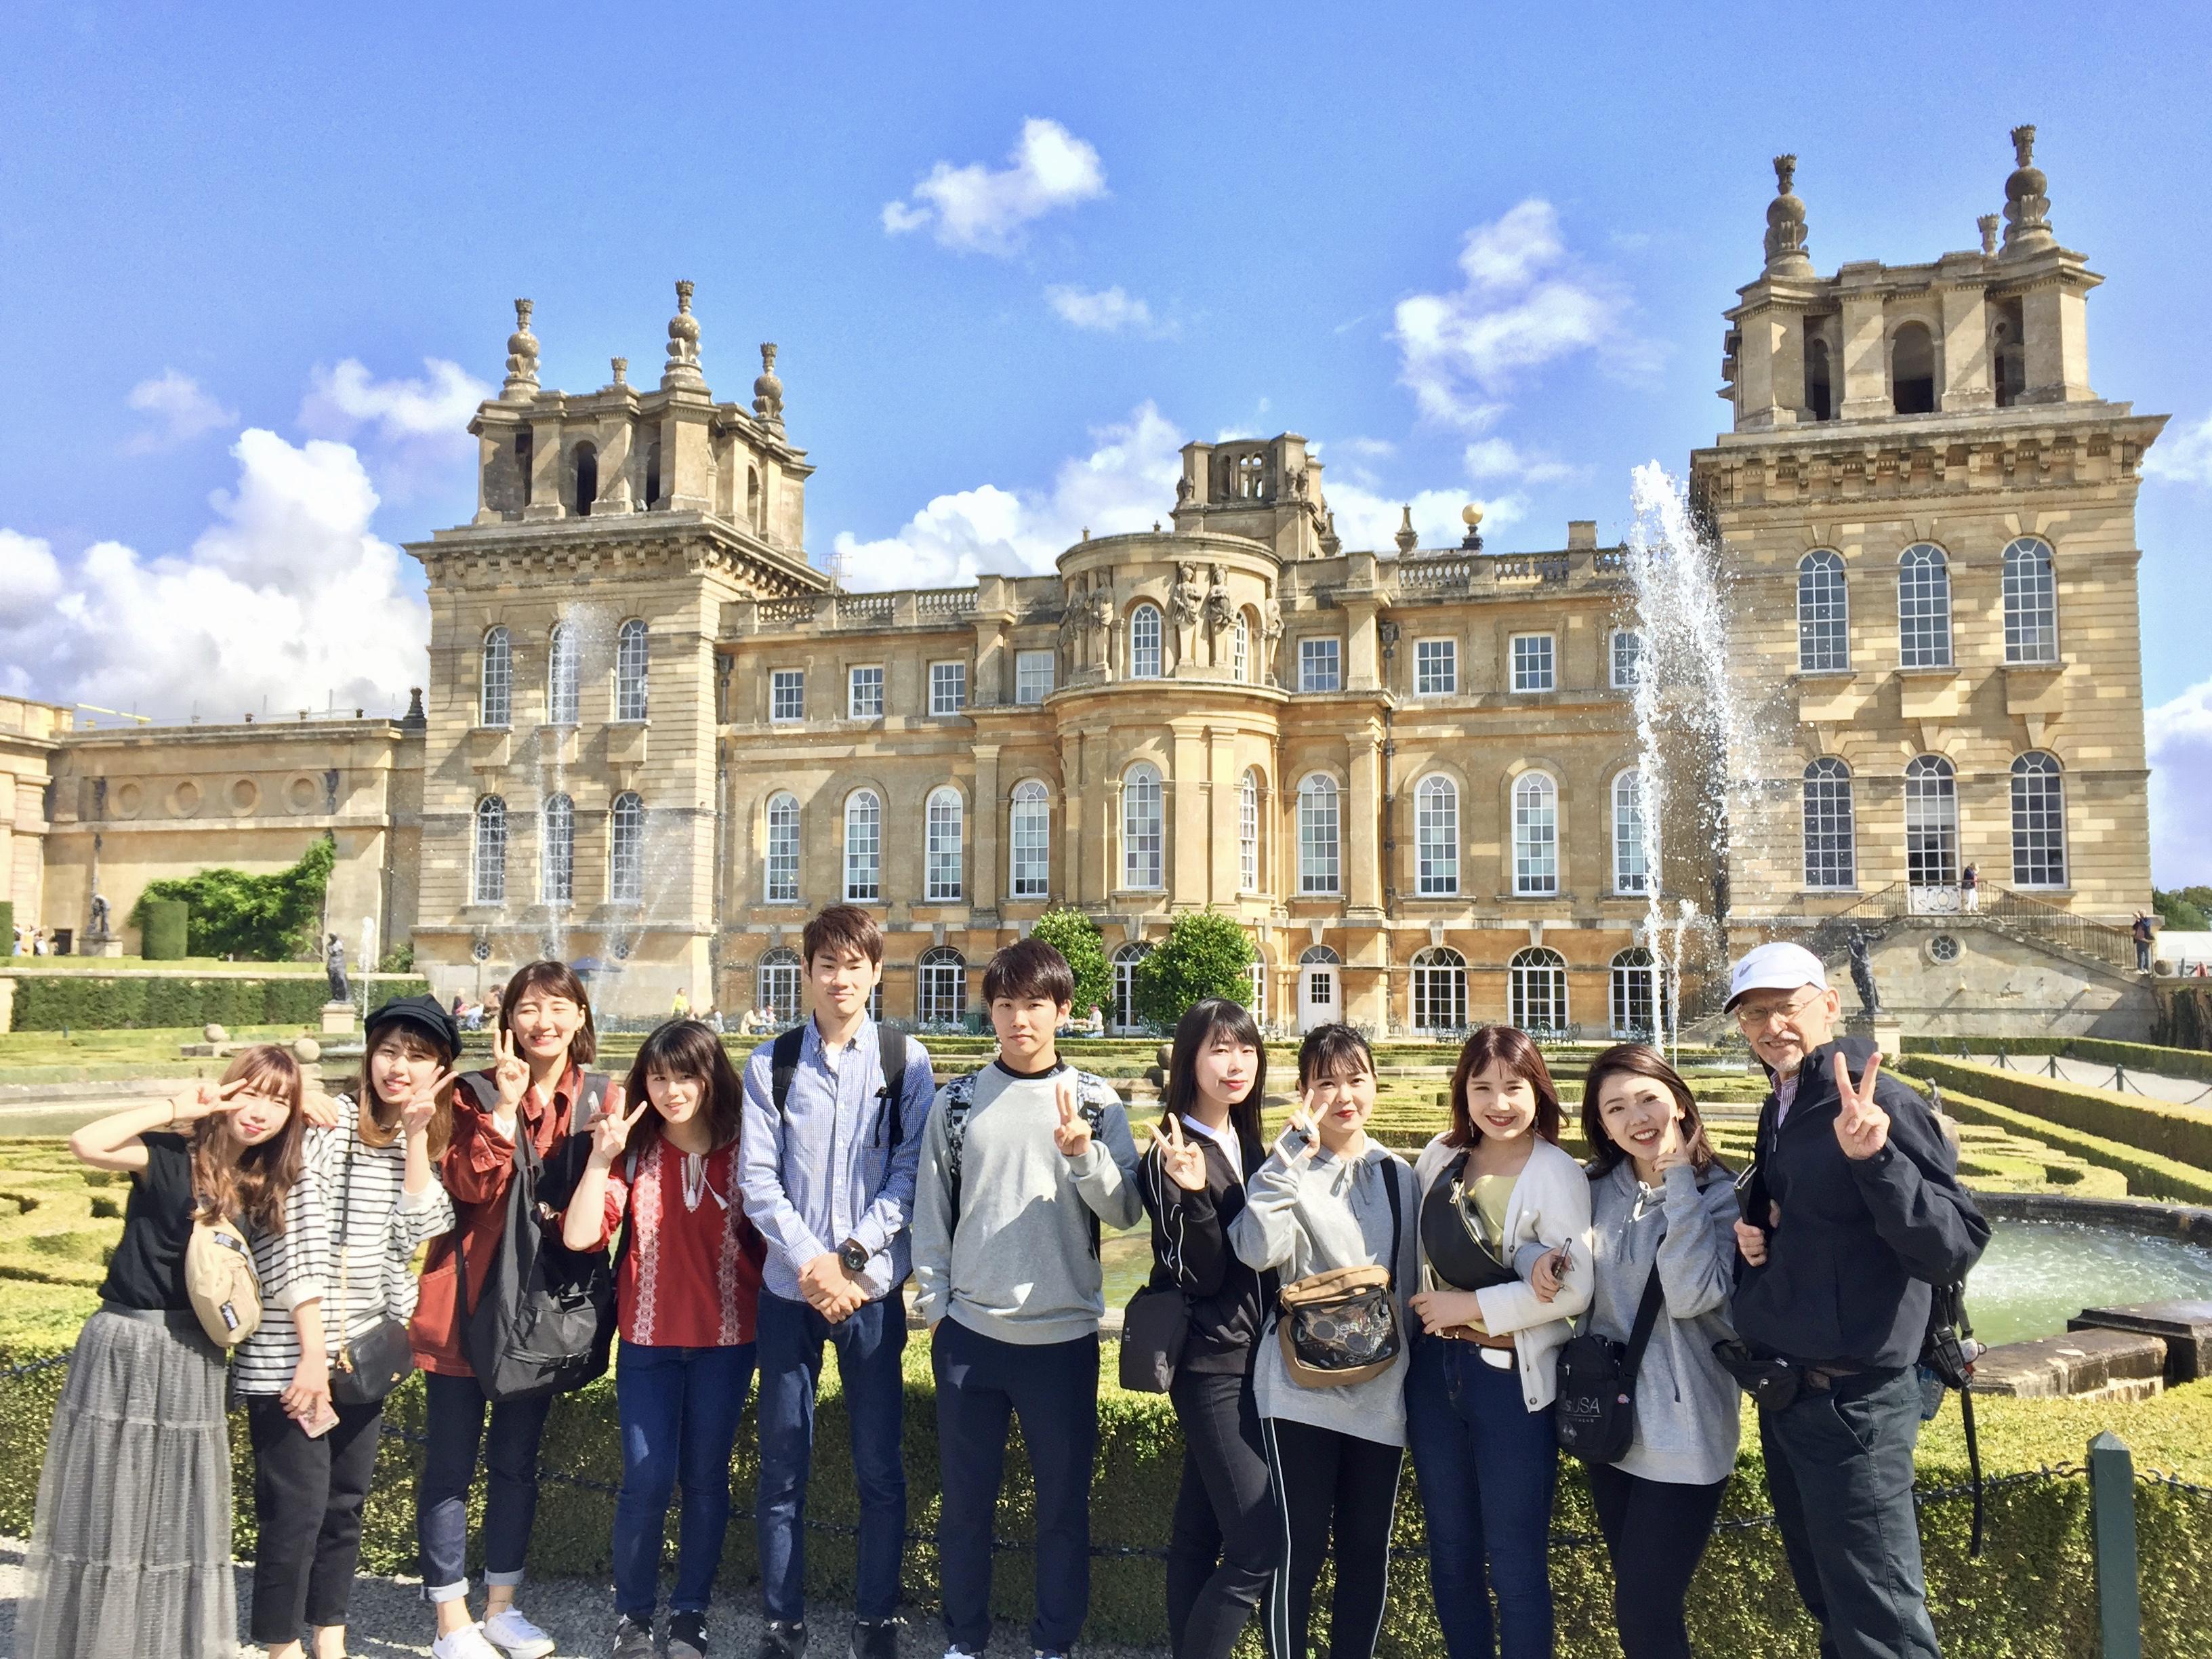 Hijiyama University students visit Blenheim Palace